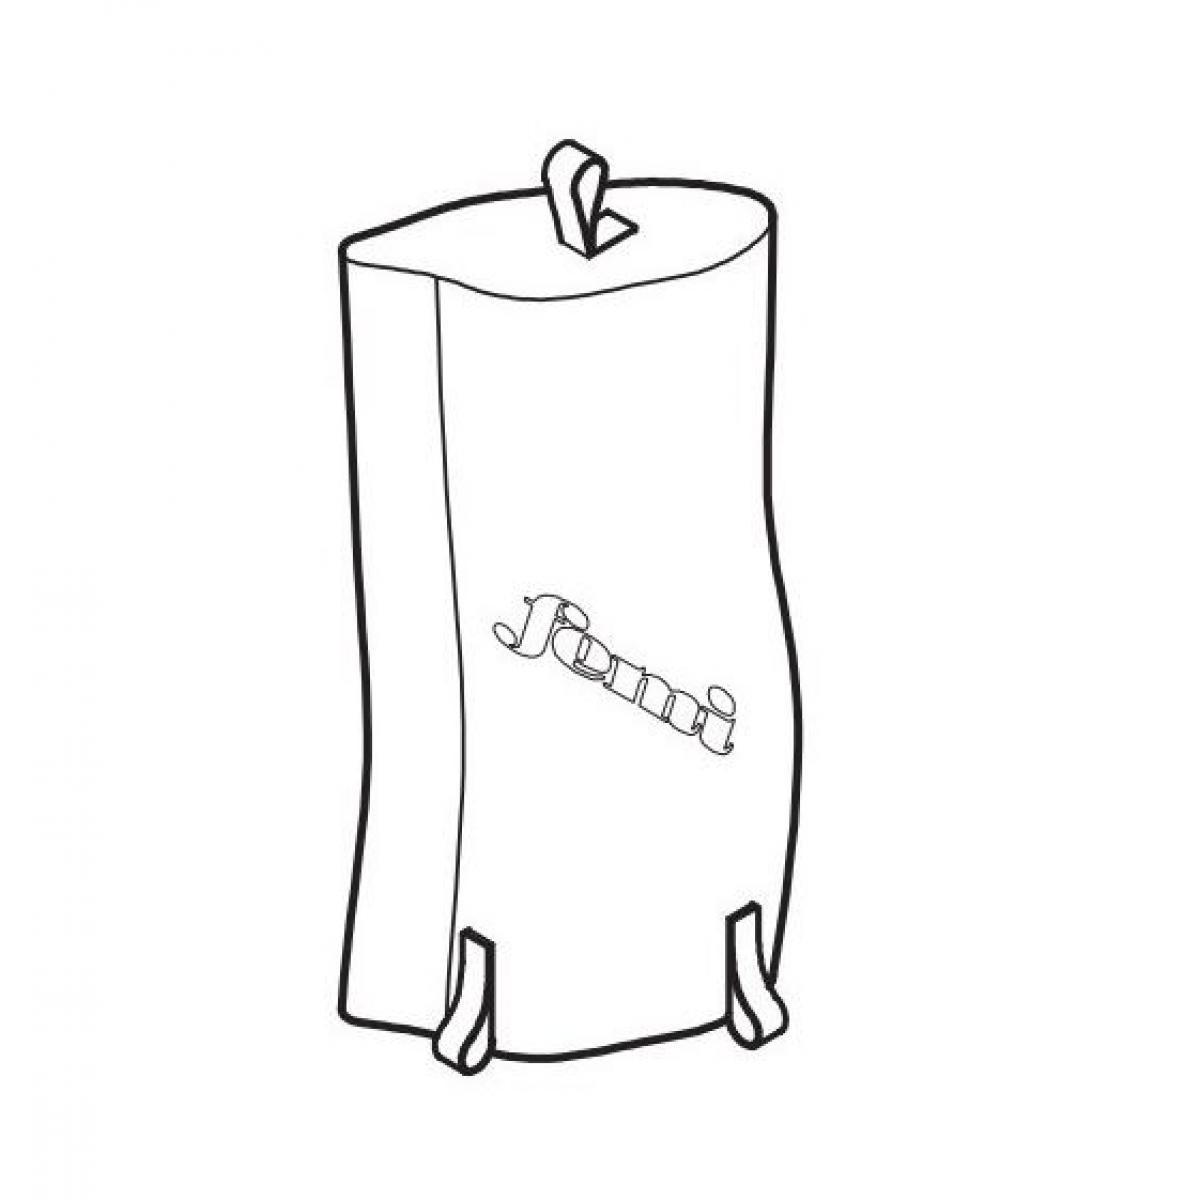 Femi Femi - Sac filtrant tissu en feutre Ø 370x640 mm 30 microns - 350 PLUS